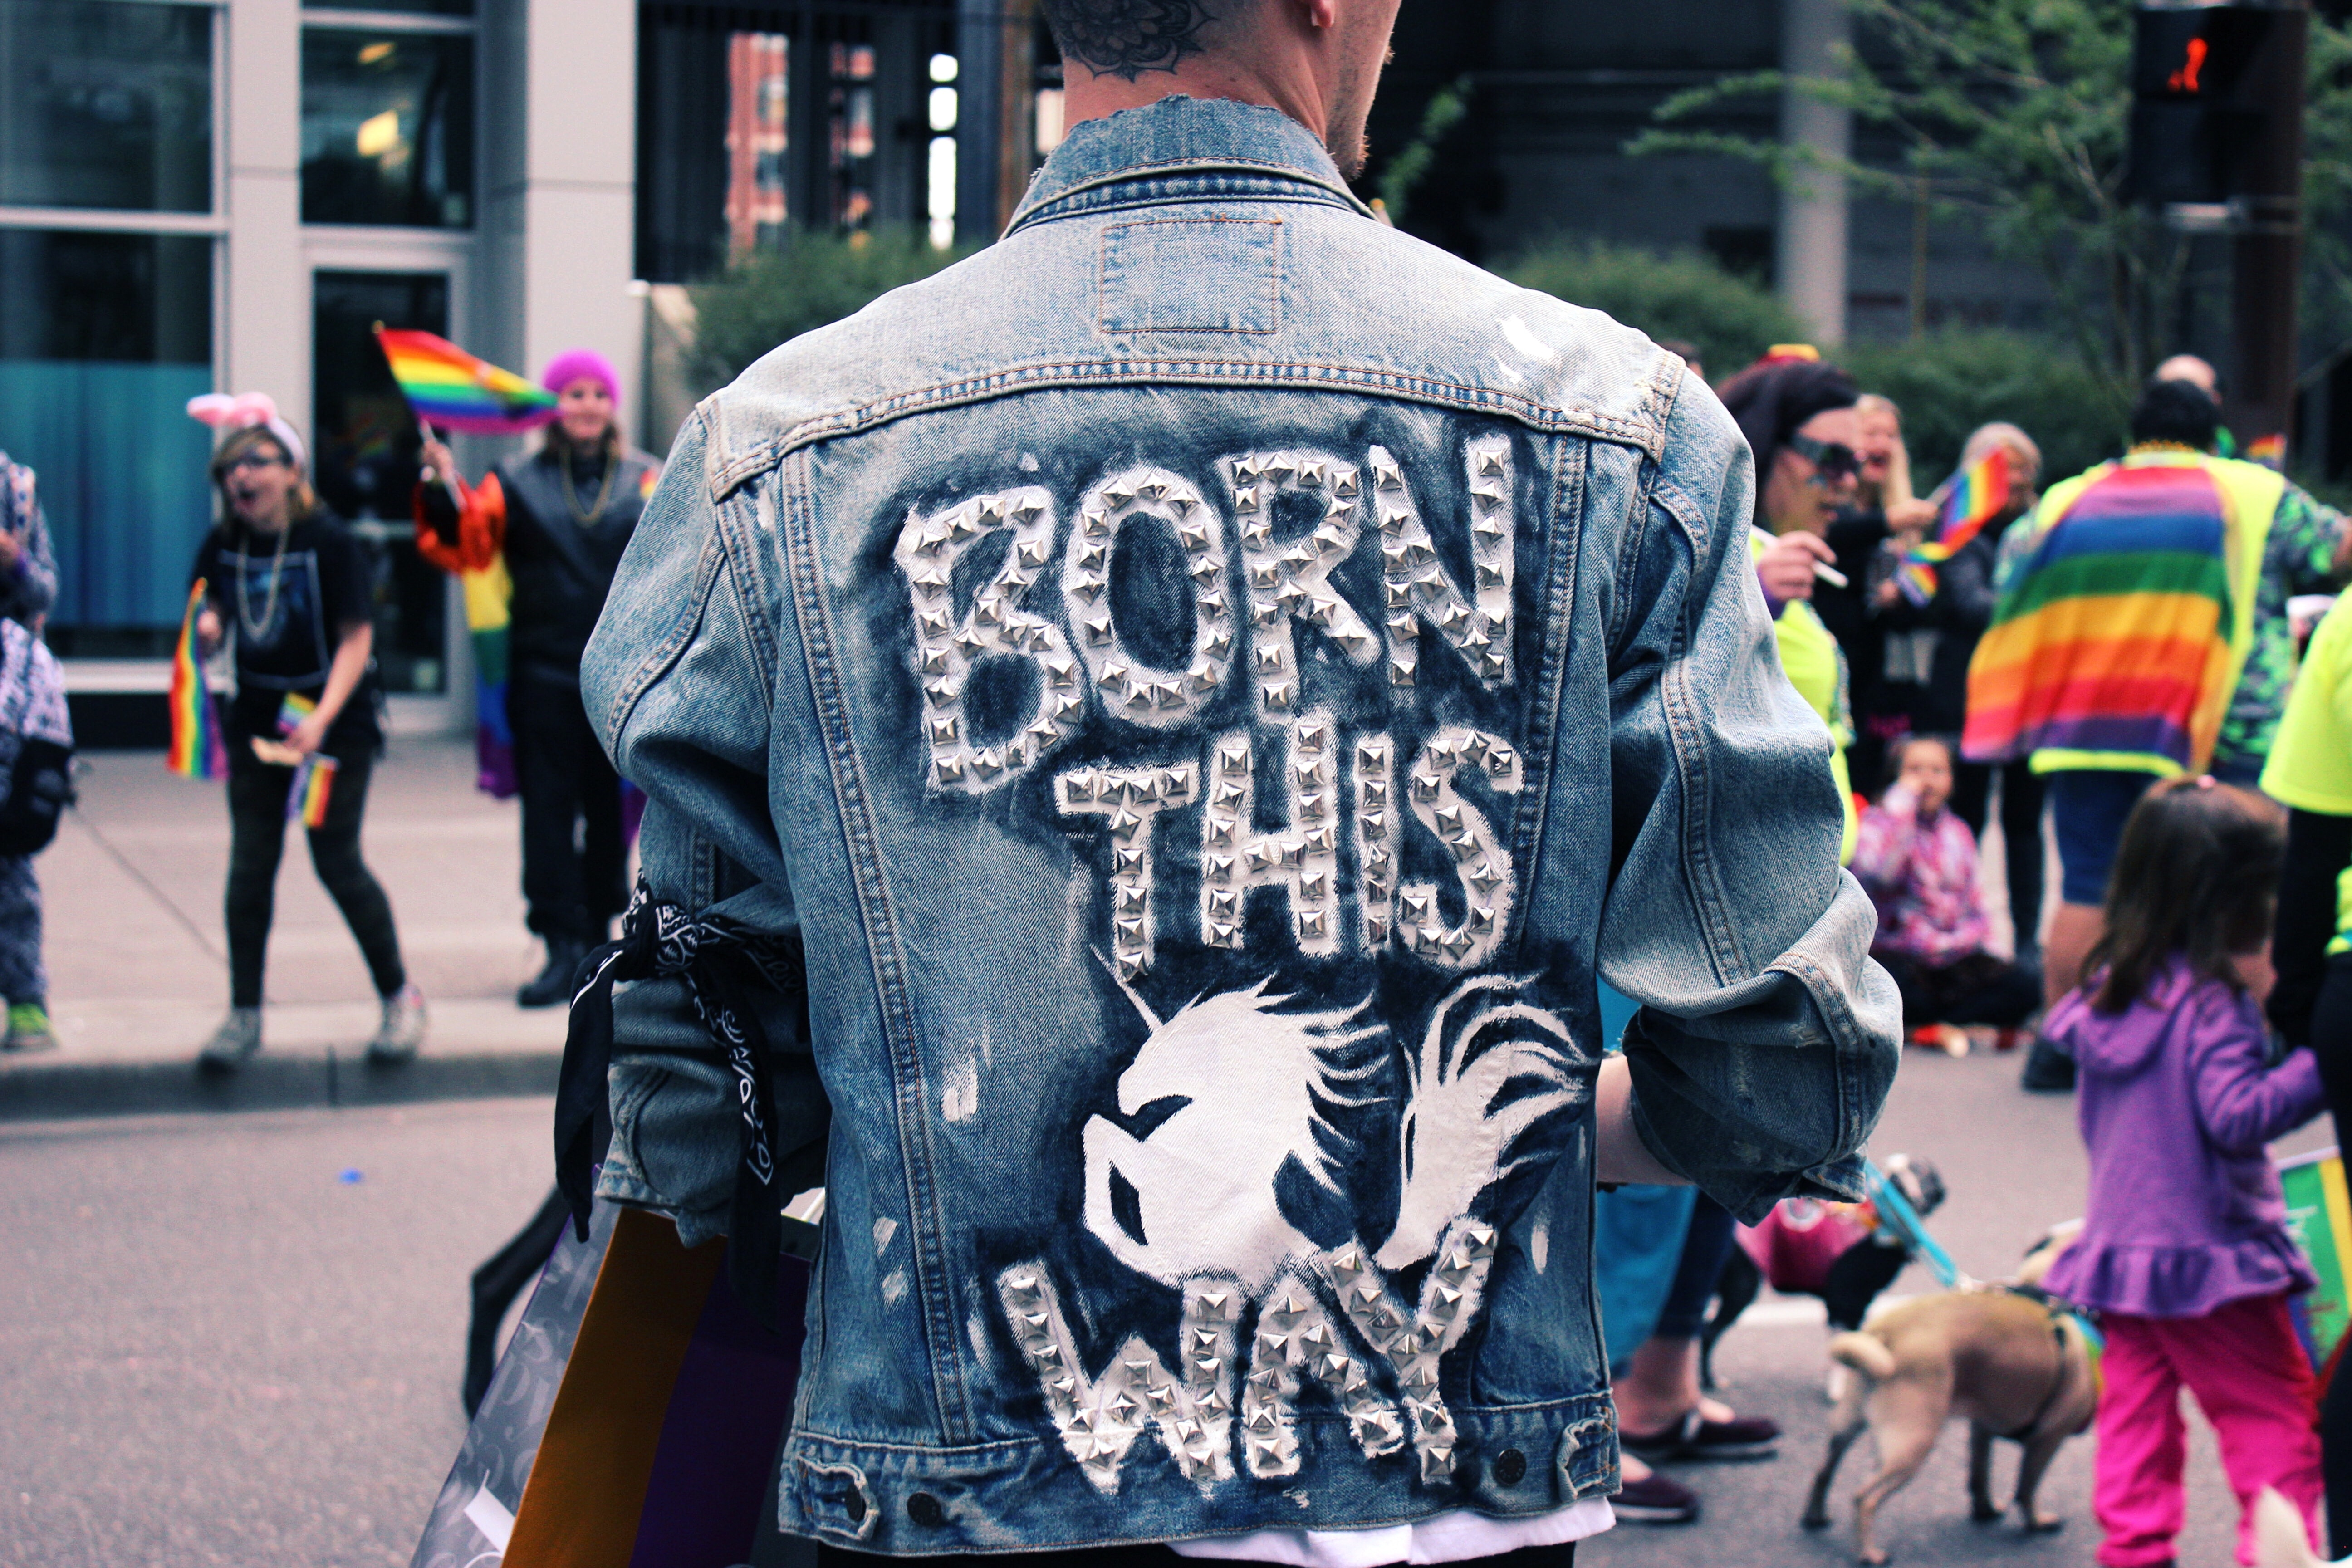 born this way.jpg